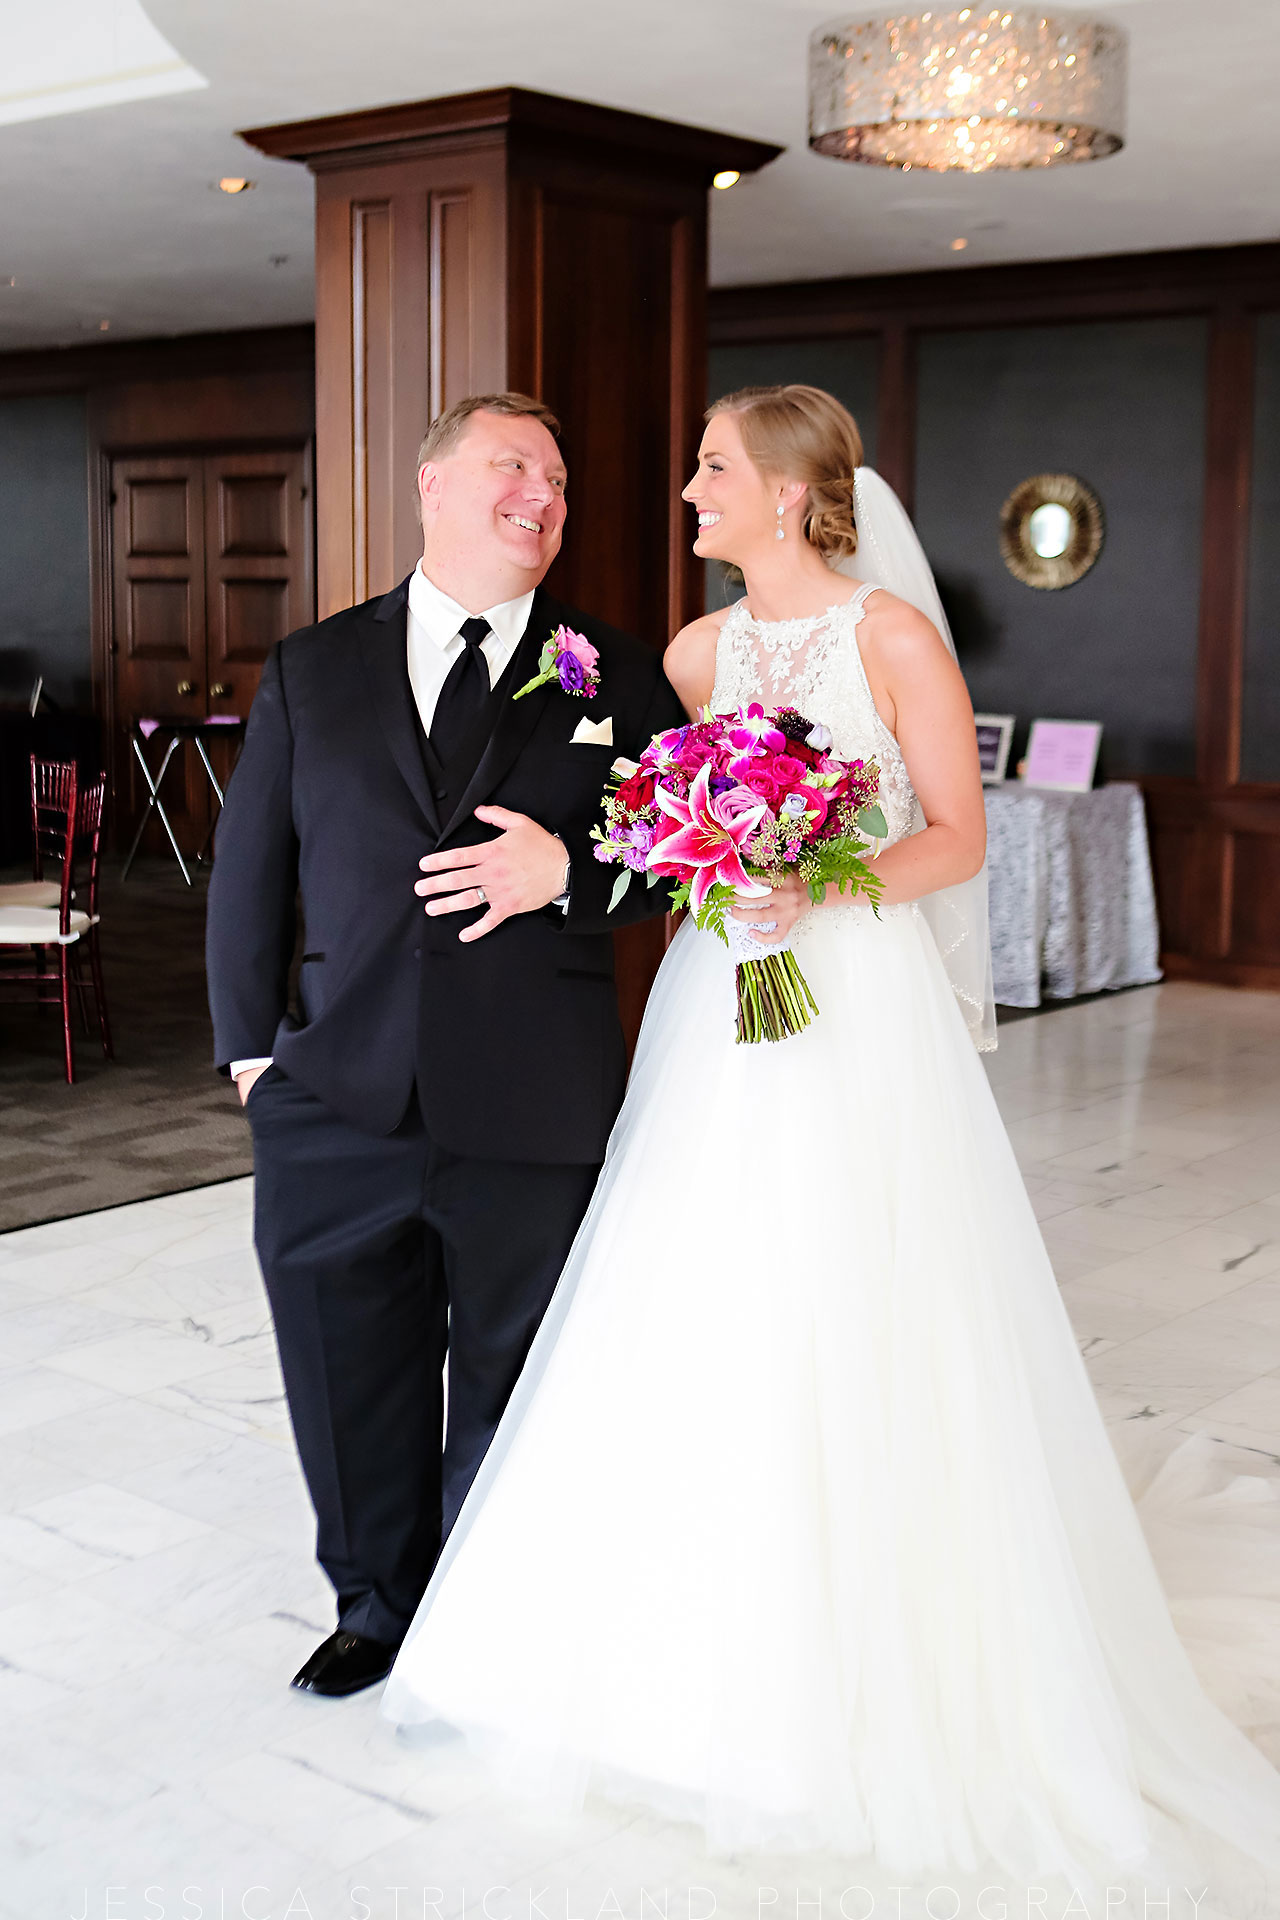 Serra Alex Regions Tower Indianapolis Wedding 153 watermarked